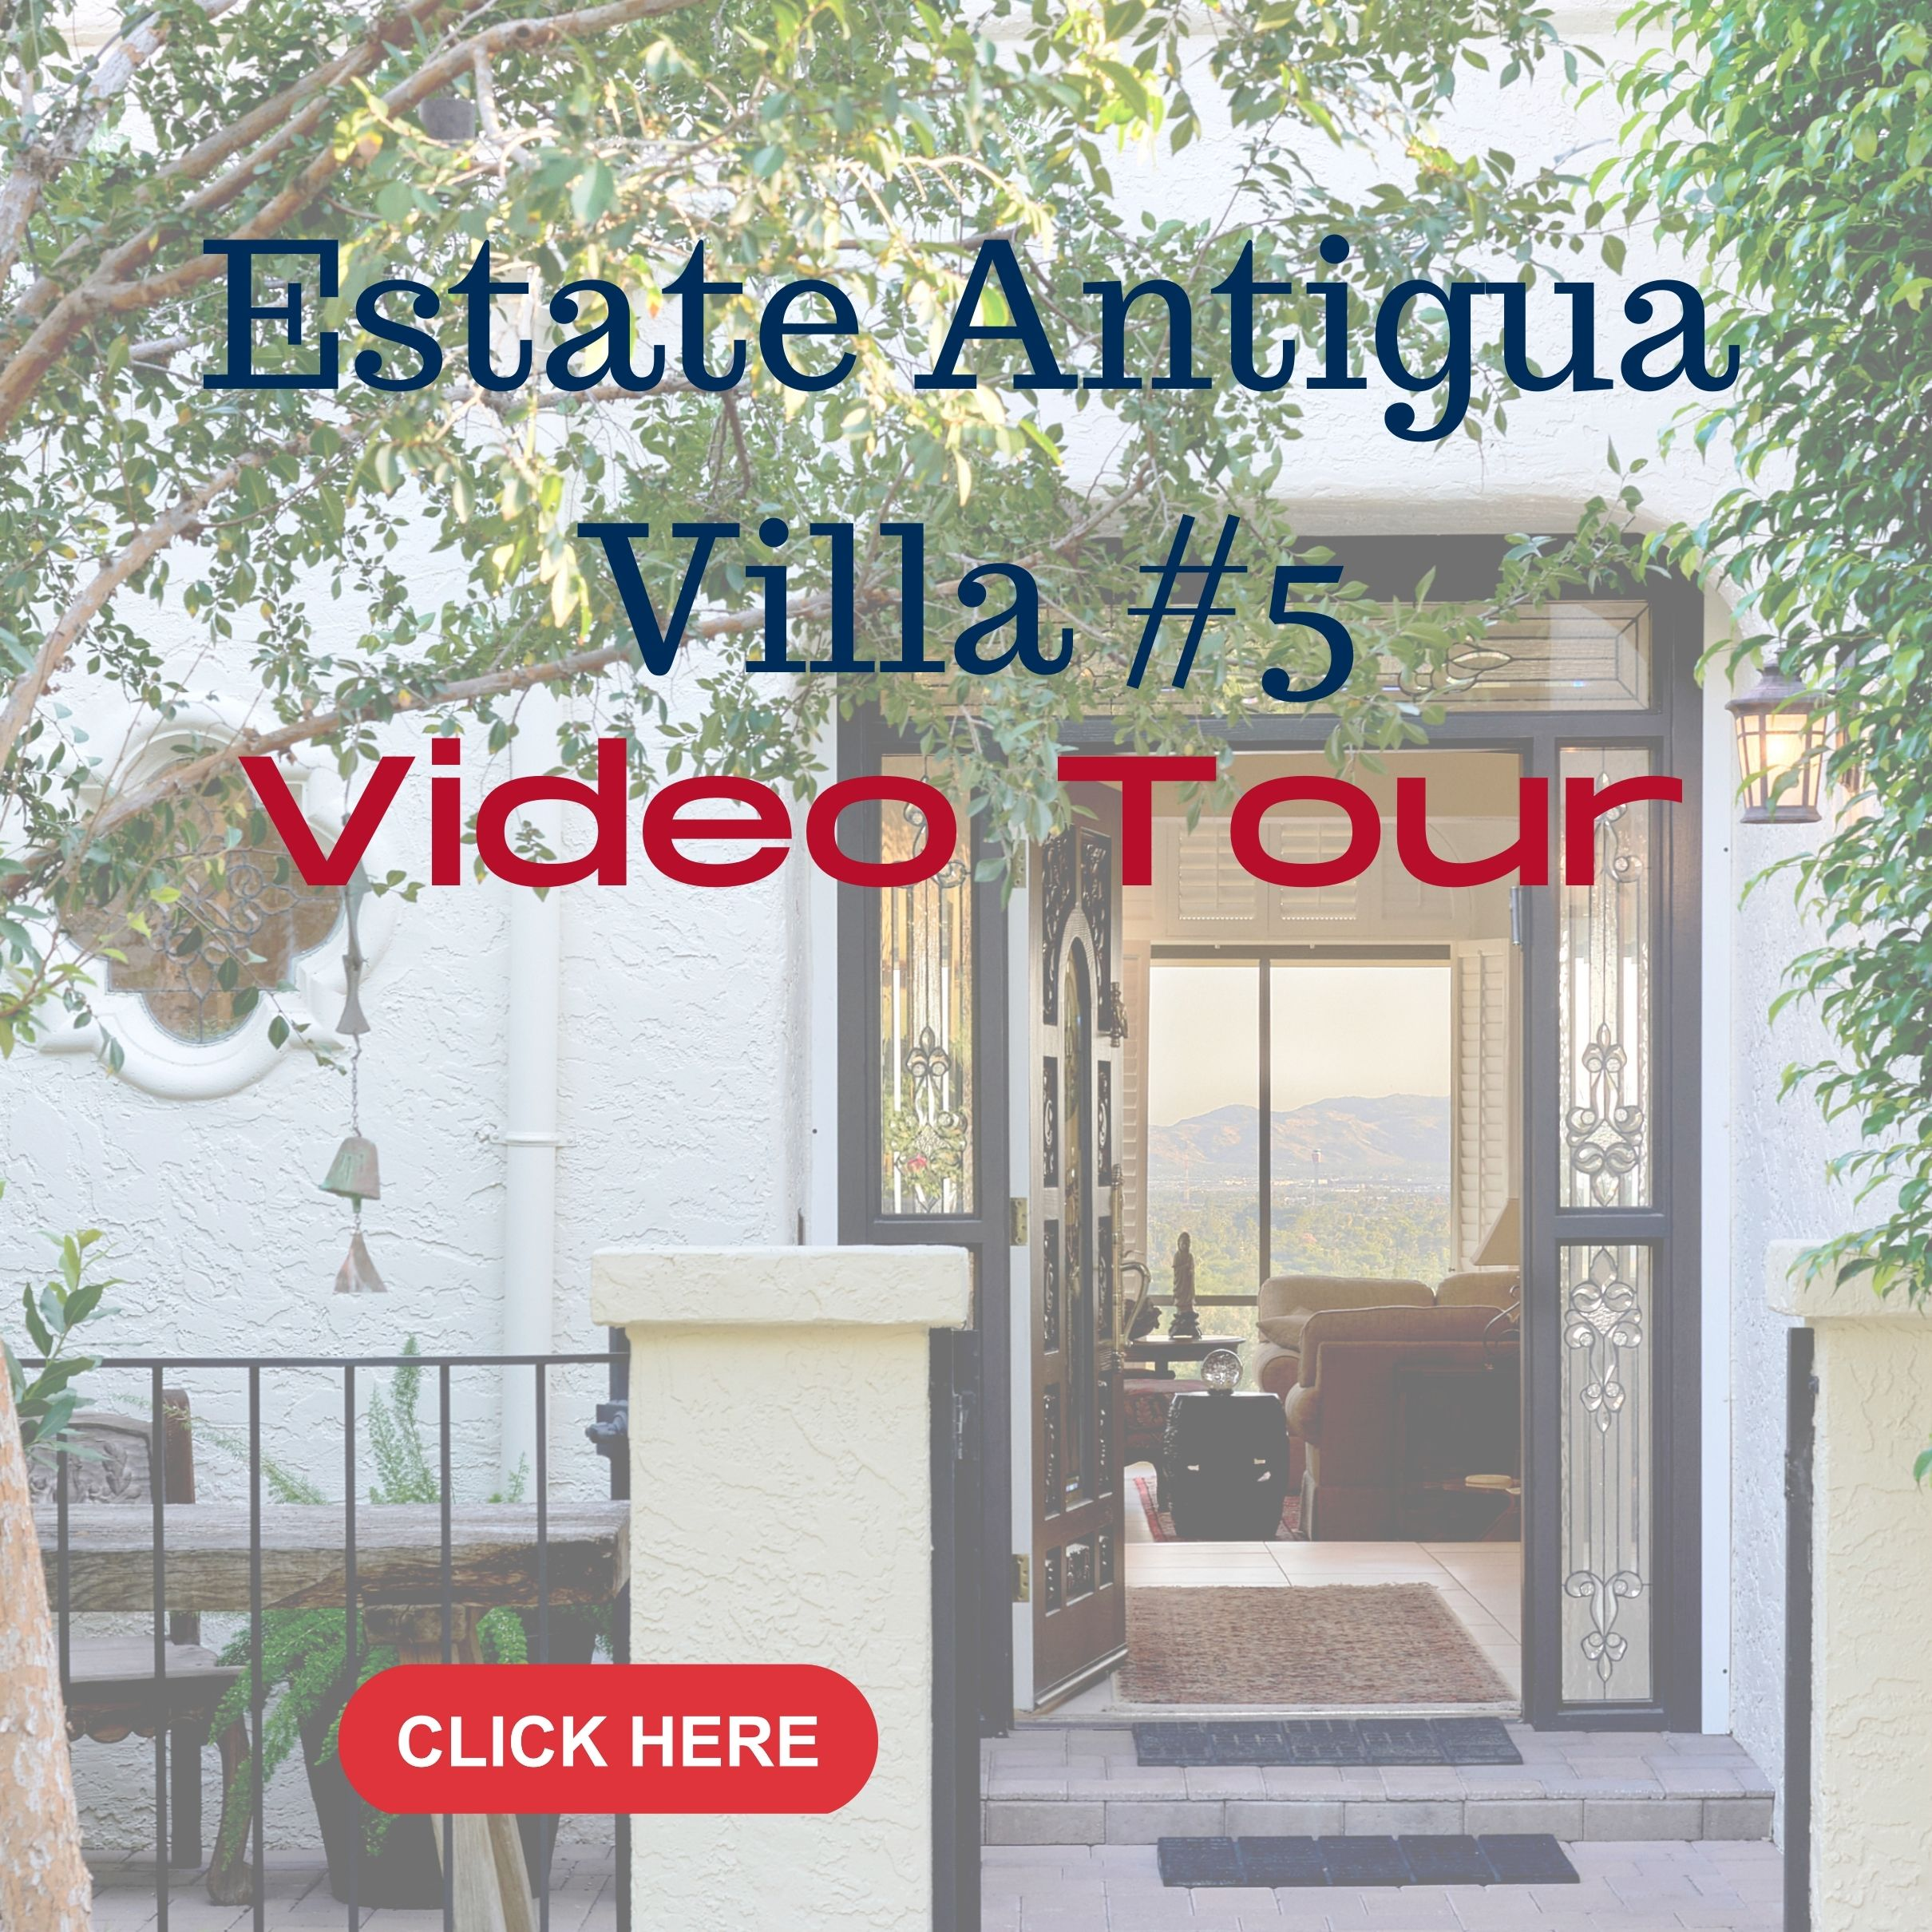 Video Tour Villa #5 Estate Antigua